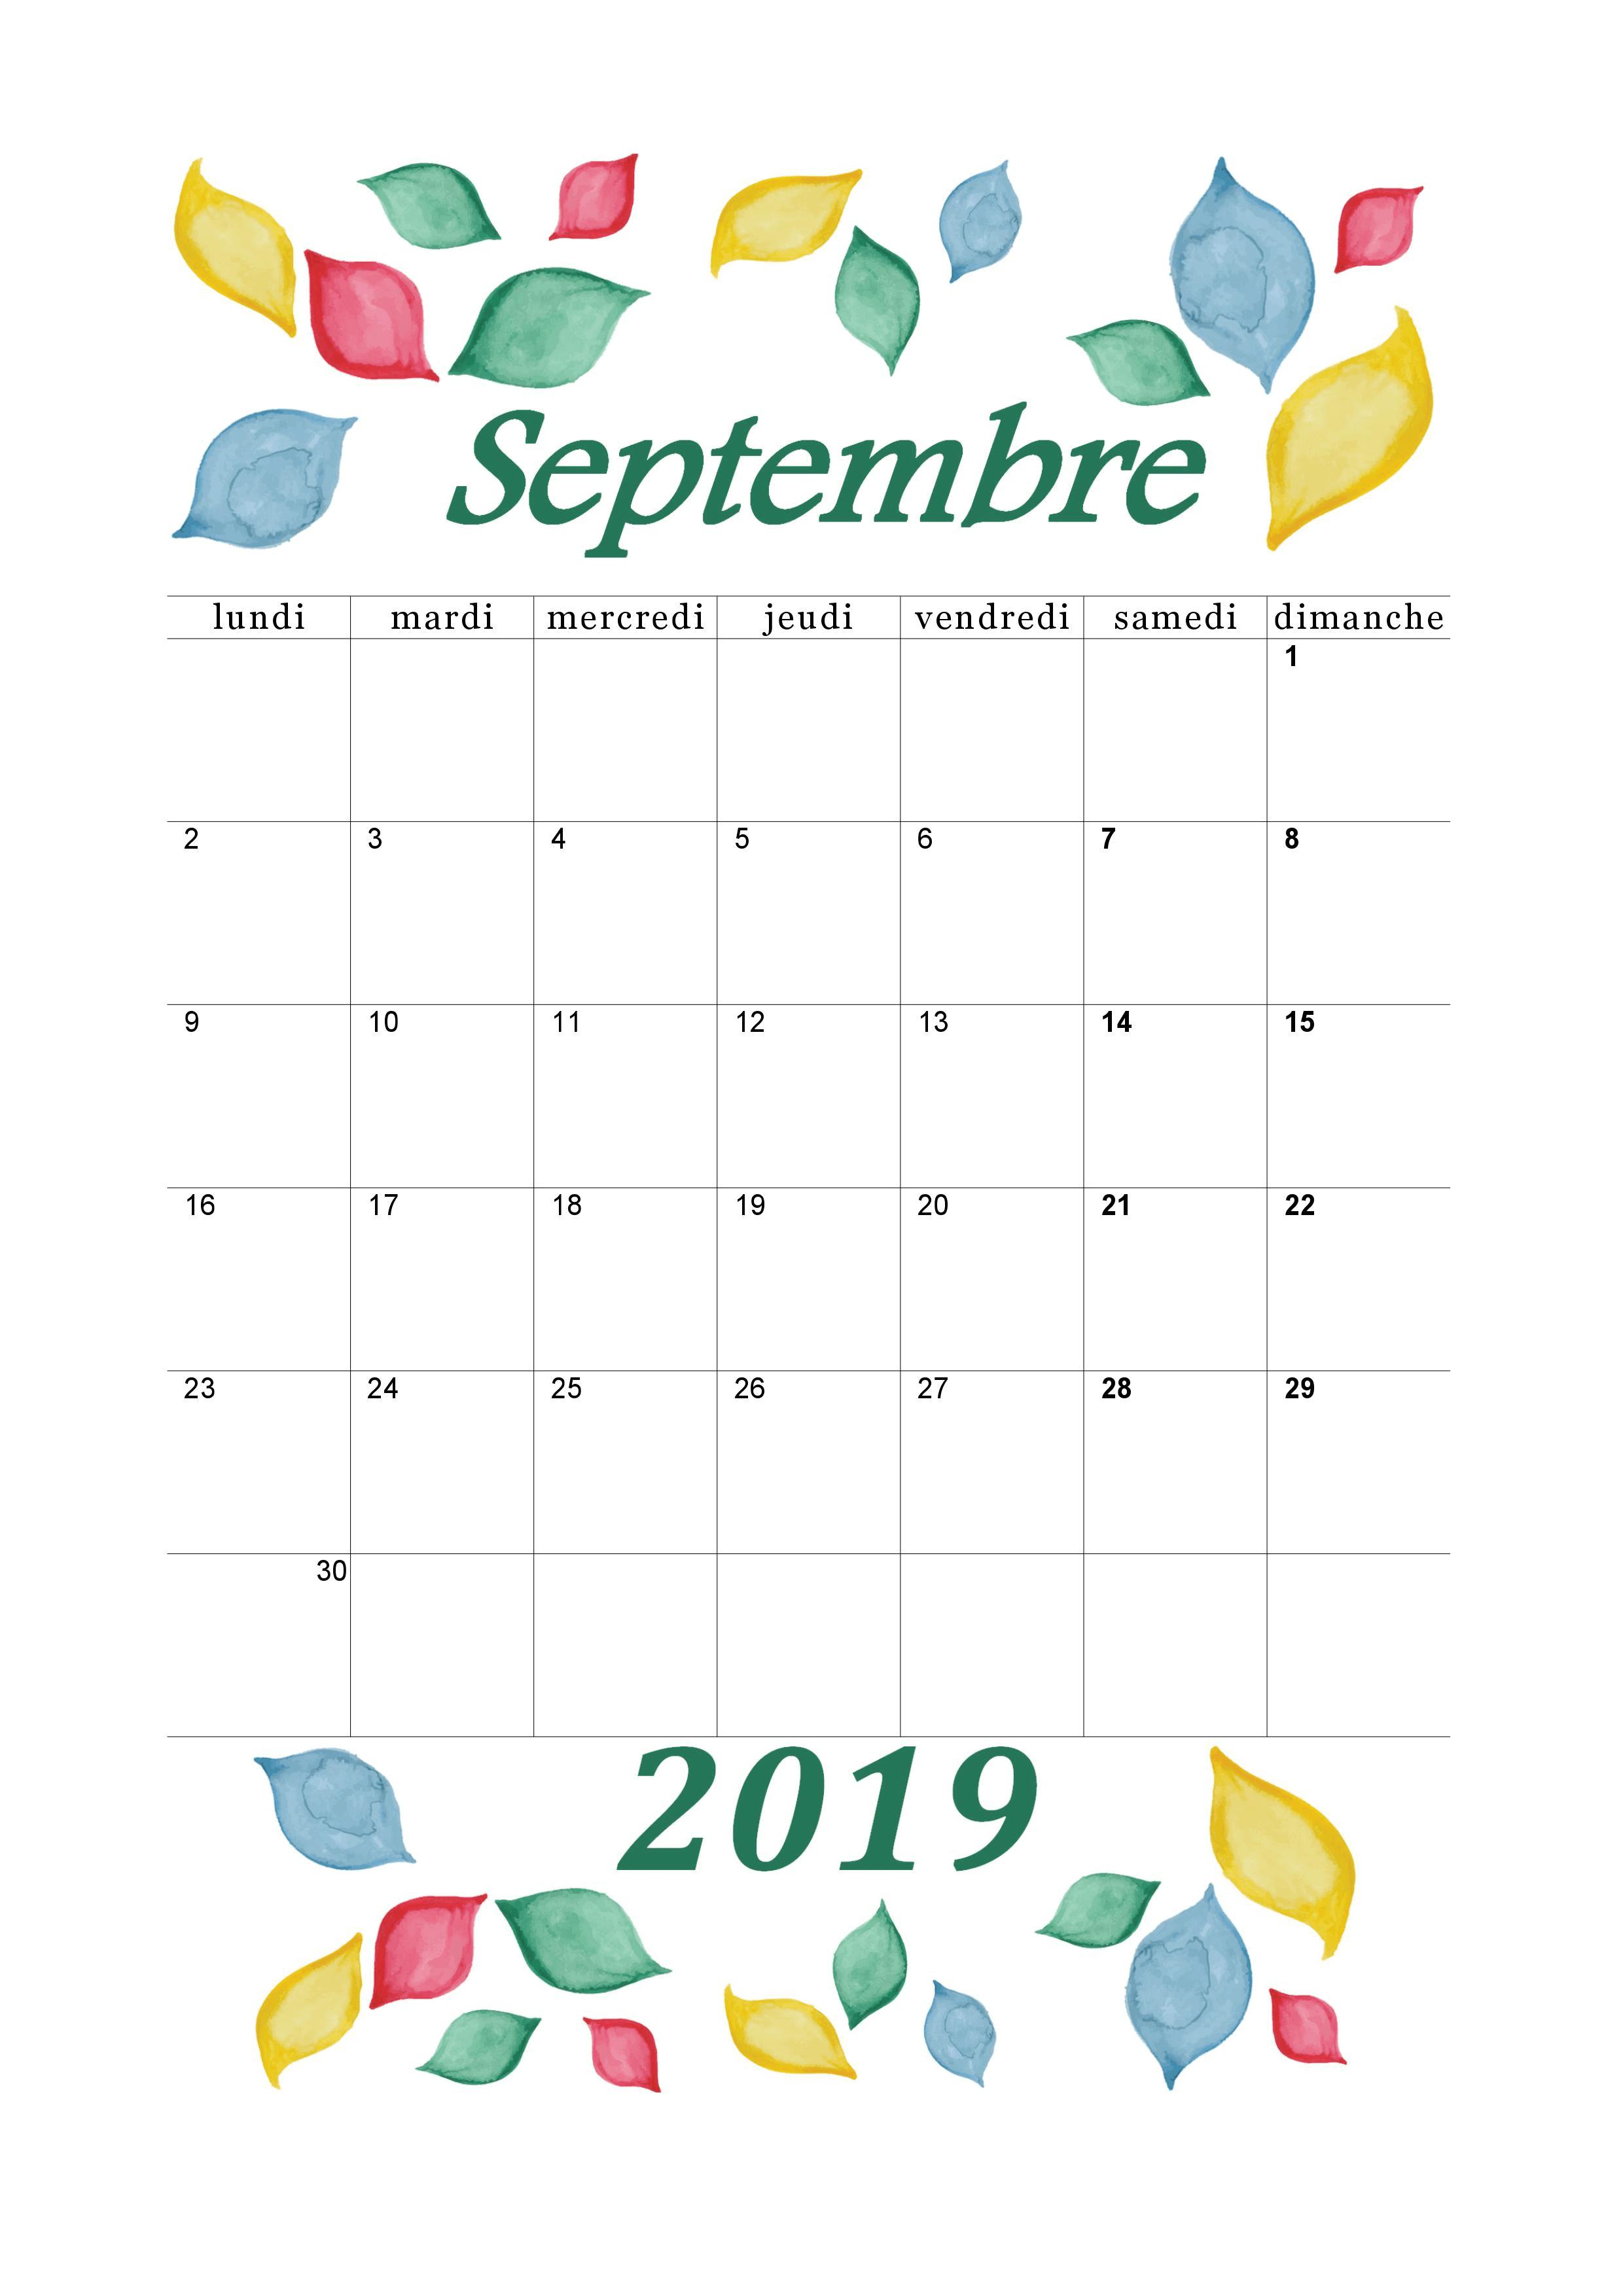 Calendrier Mois De Septembre.Calendrier Septembre 2019 A Imprimer Calendriers